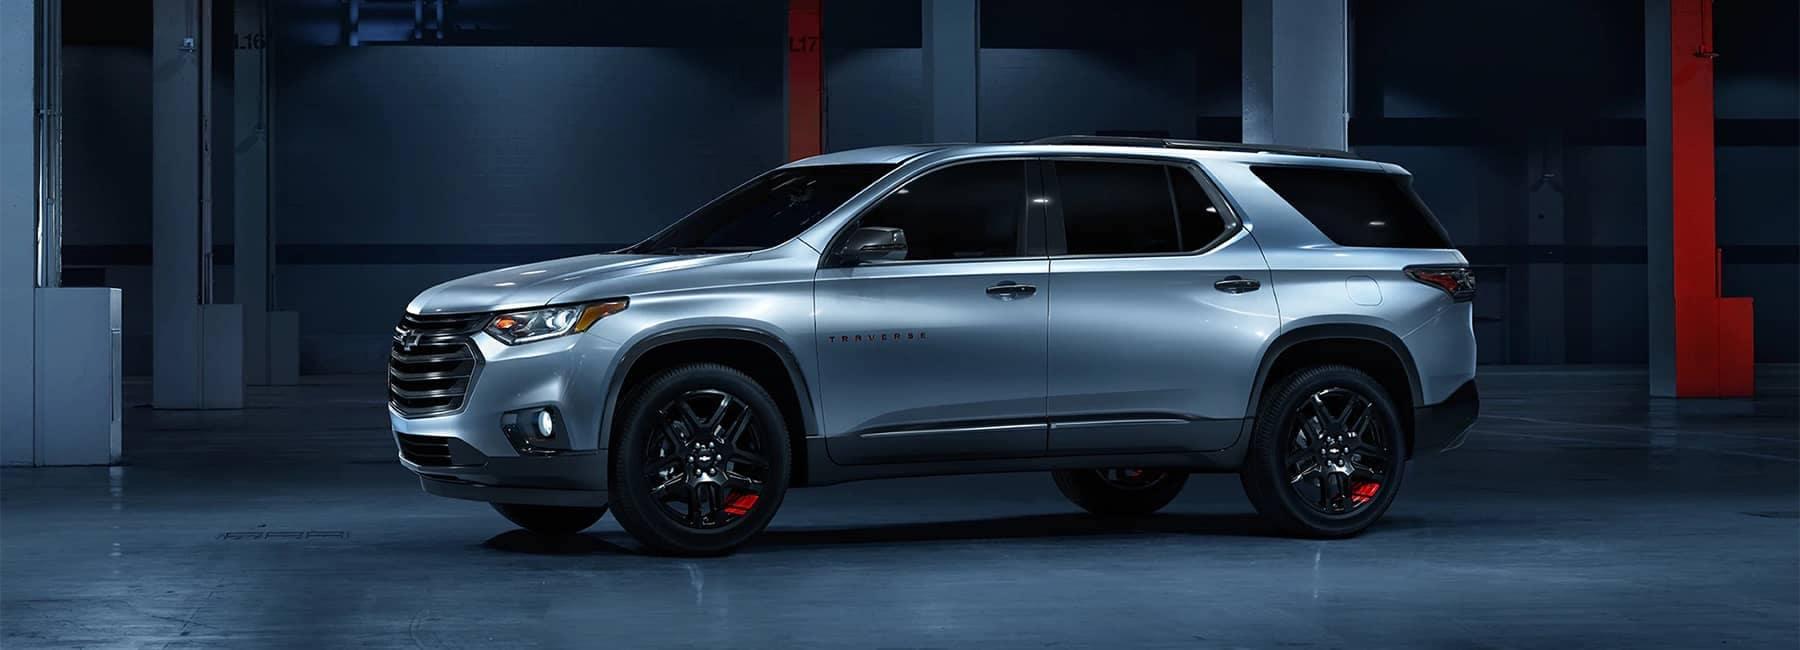 2020 Chevrolet Traverse Redline Mid-Size SUV Side Exterior